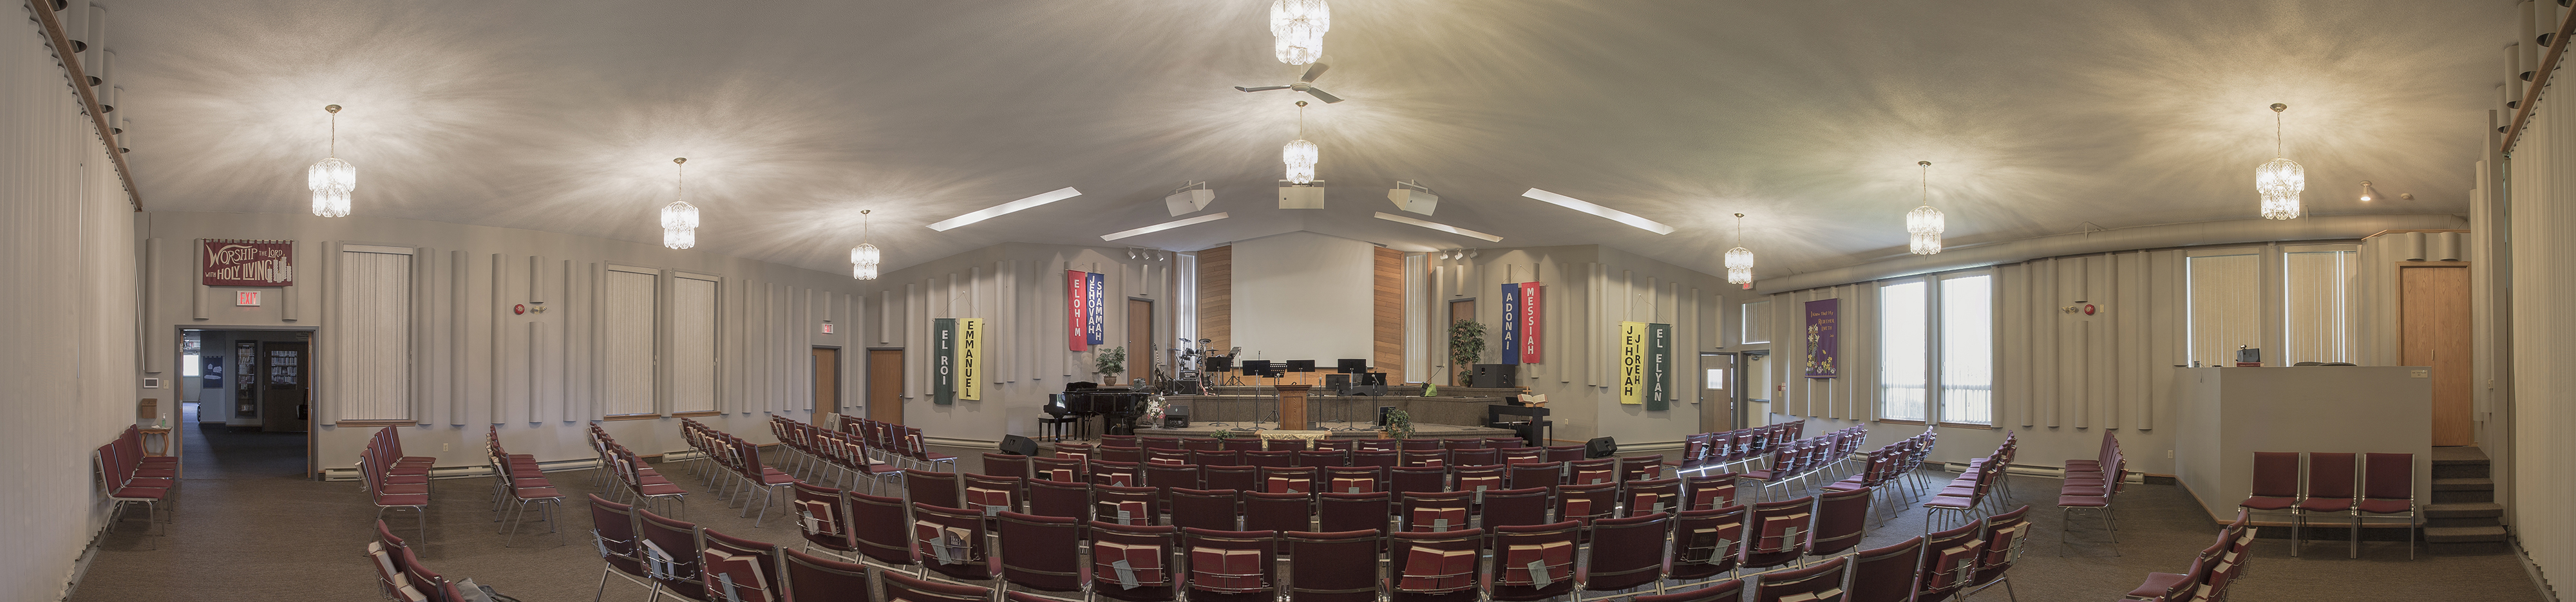 Aylmer EMC Church Pano 2017_ss